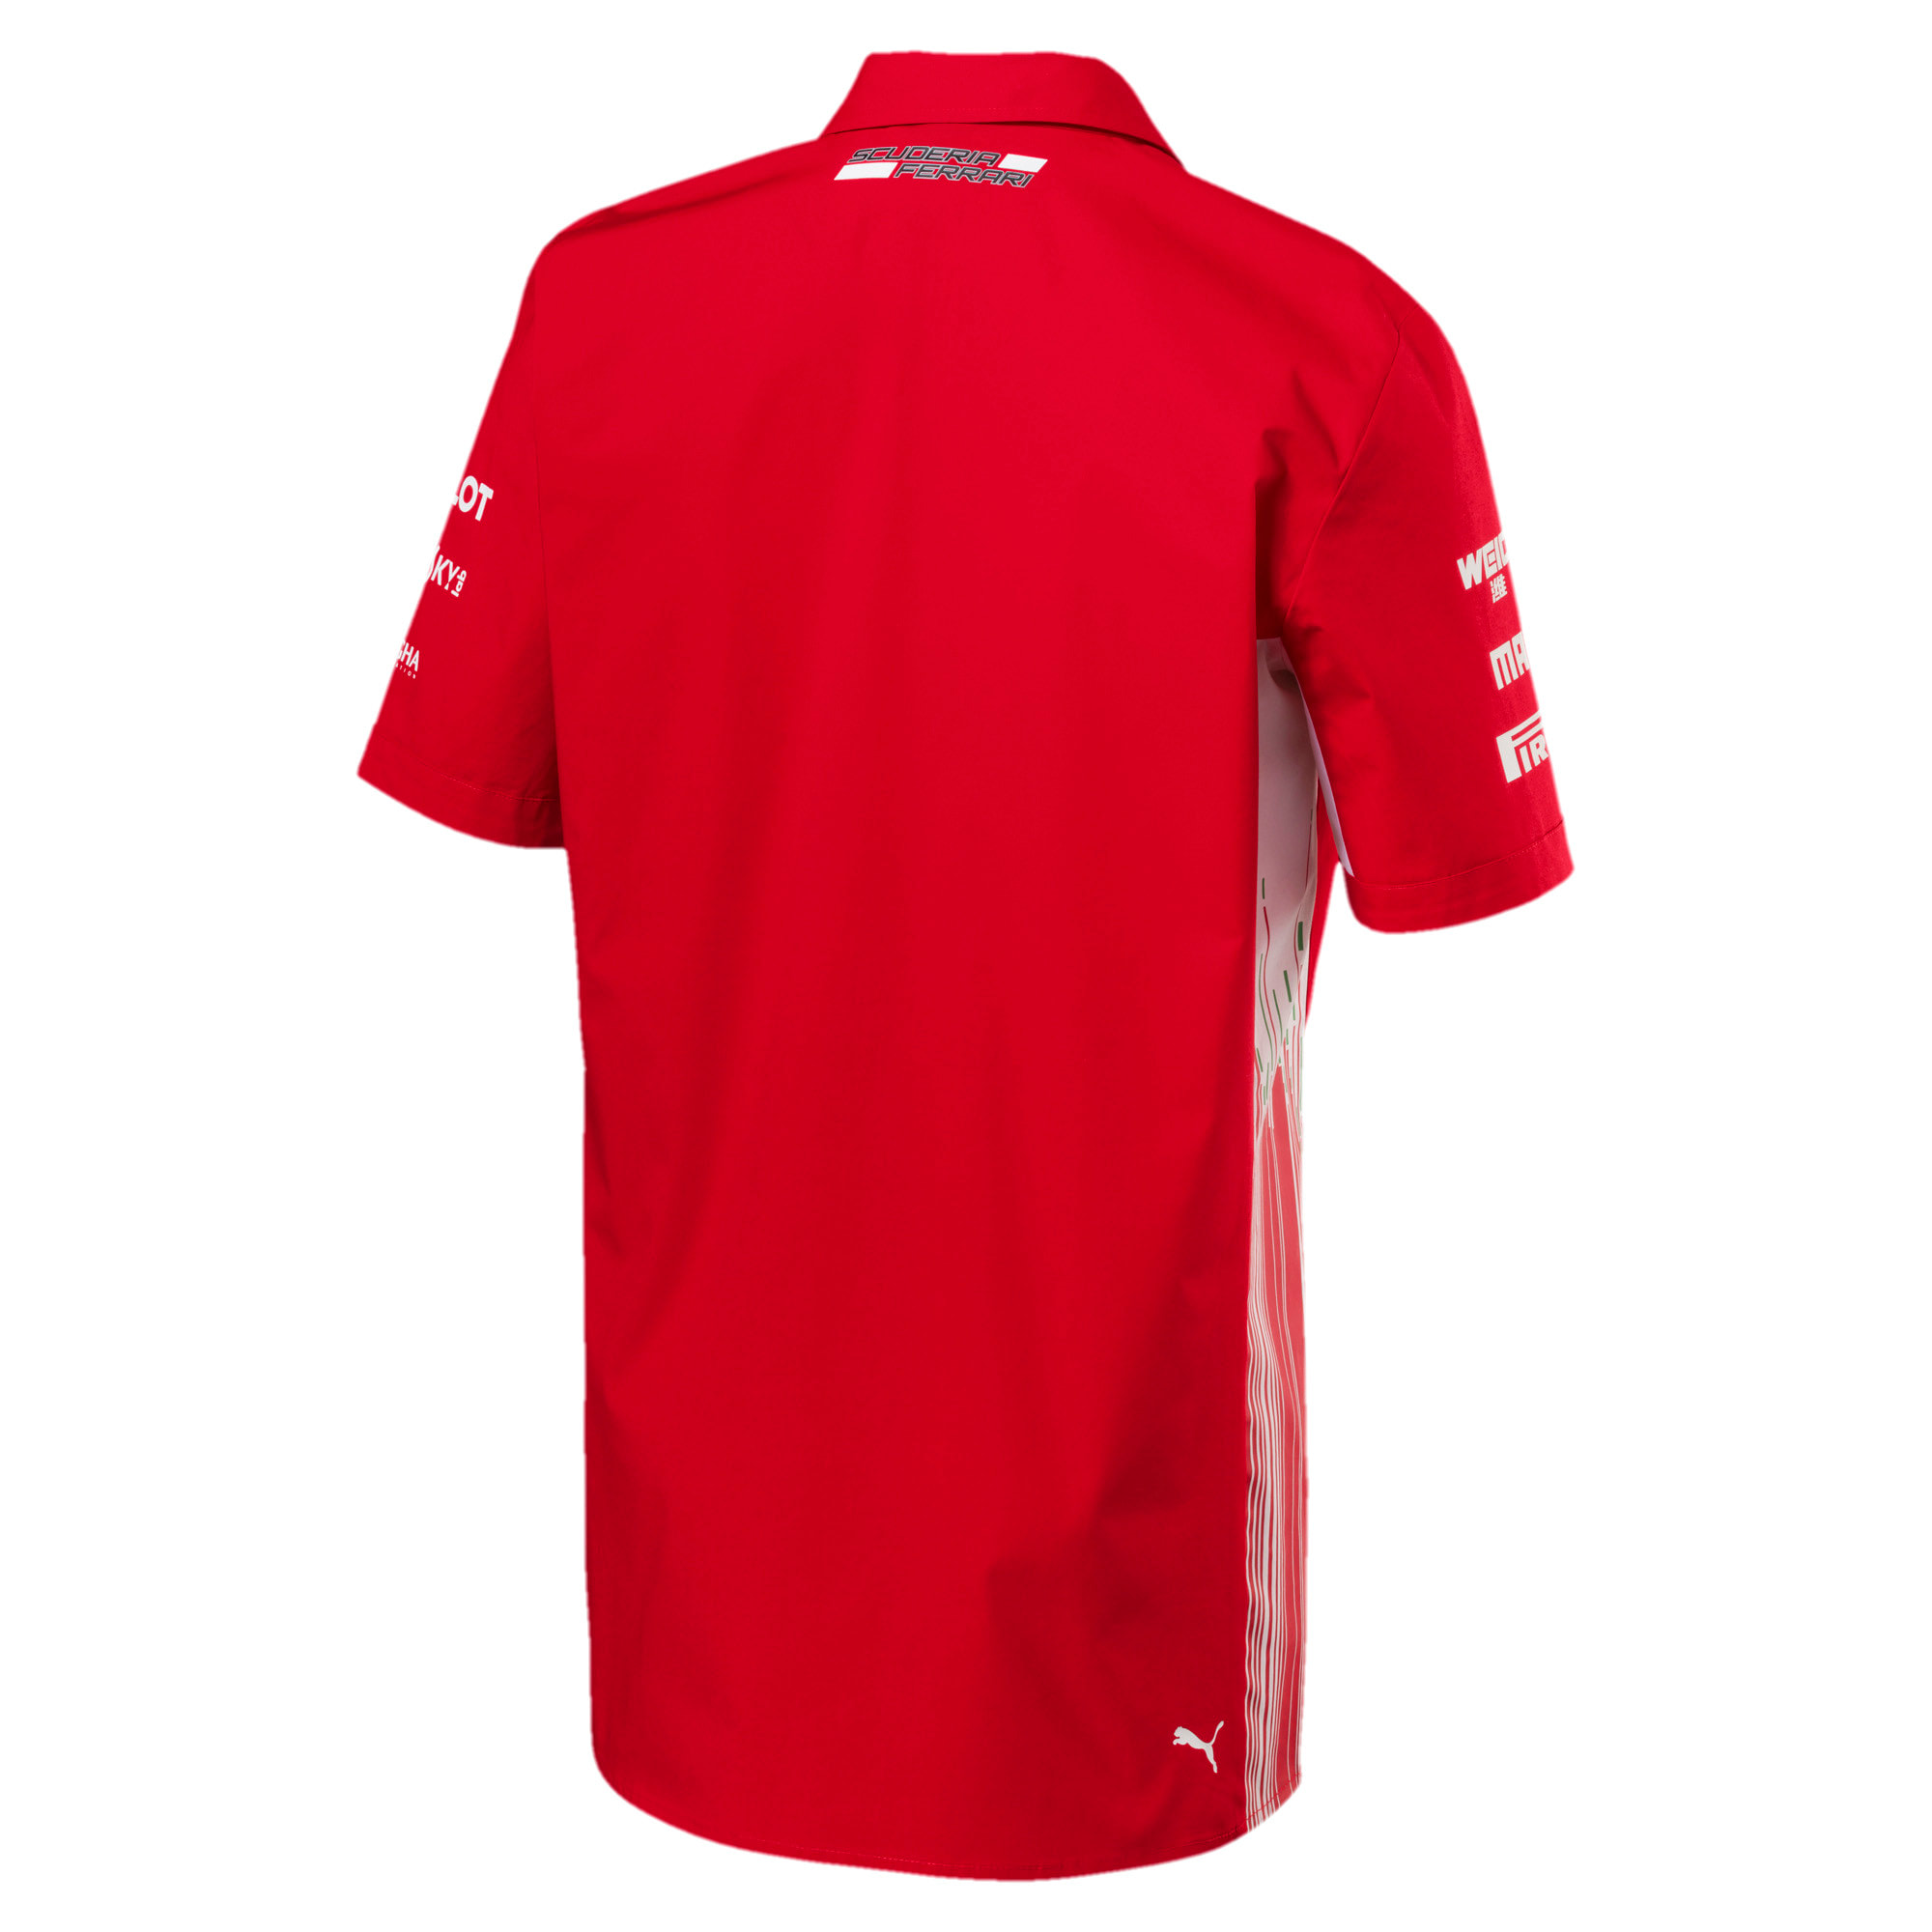 Thumbnail 3 of Scuderia Ferrari Men's Team Shirt, Rosso Corsa, medium